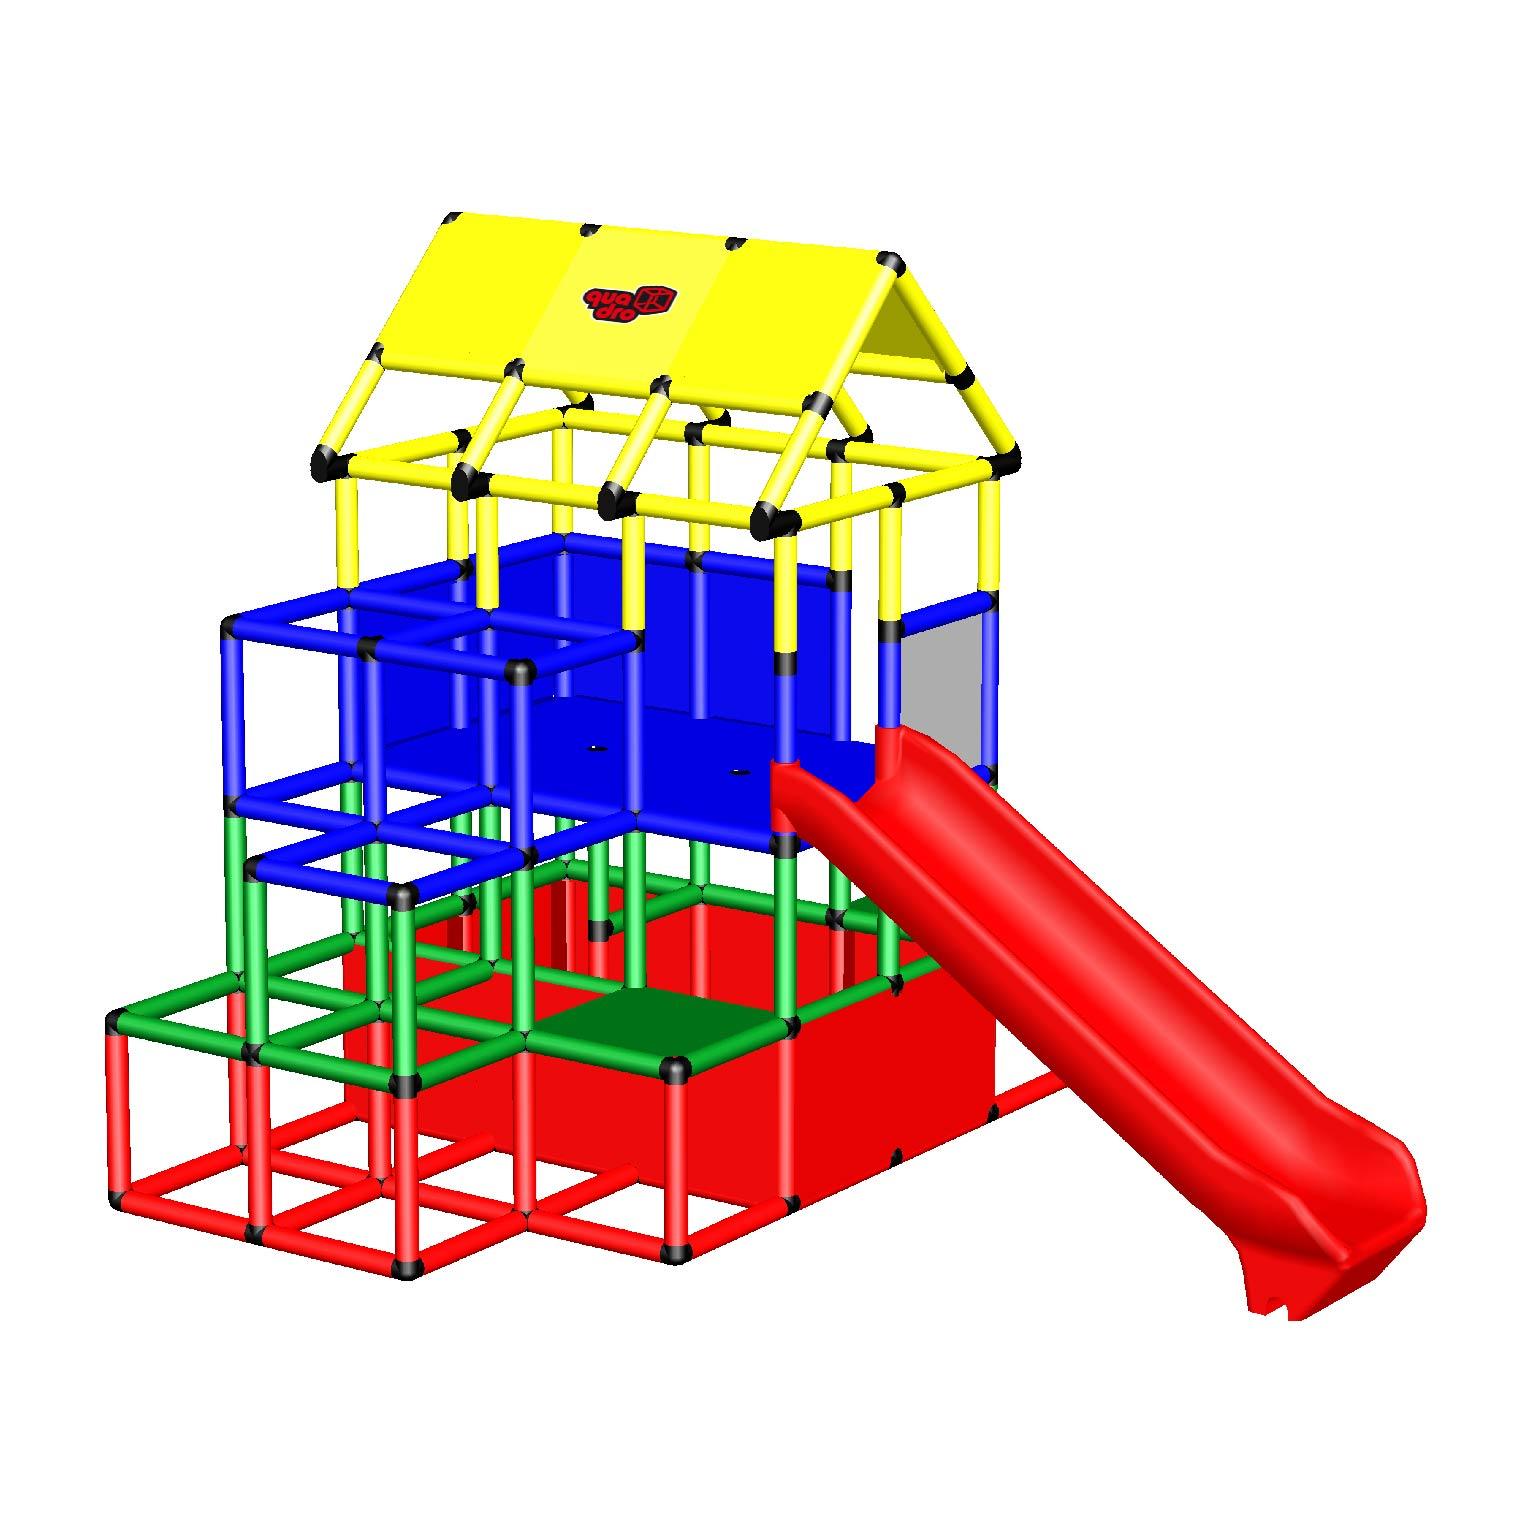 QUADROpro Playcenters